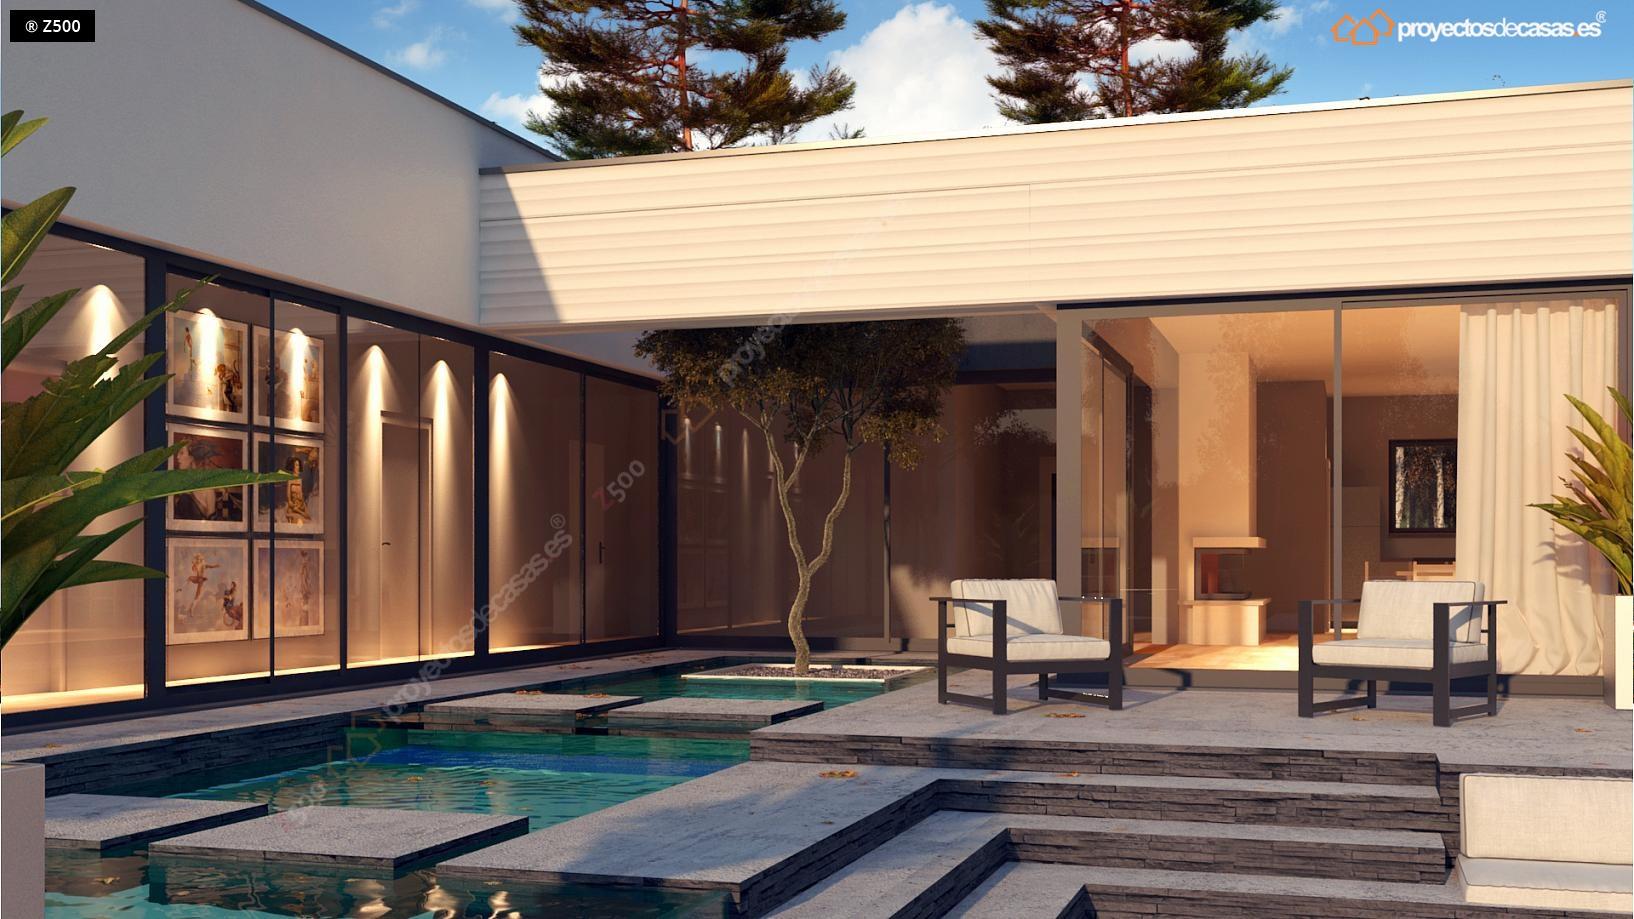 Proyectos de casas casa moderna de 1 planta con piscina for Casa moderna 3 habitaciones